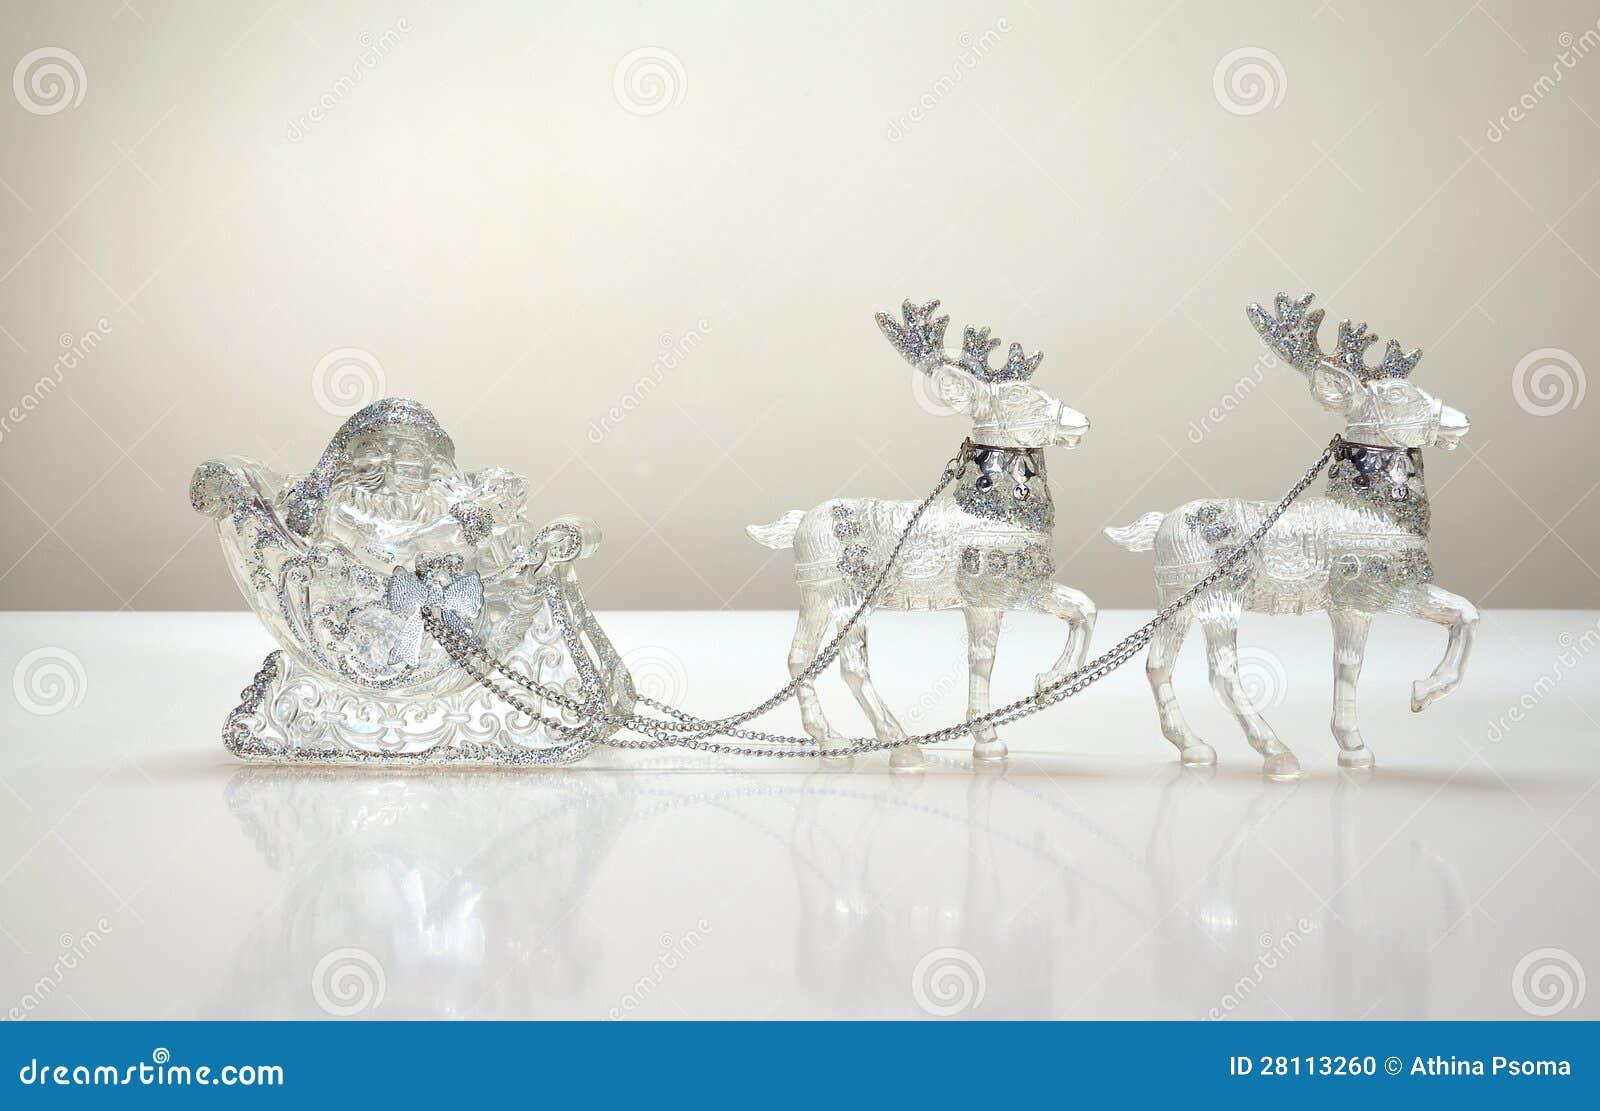 Дед Мороз в санях северного оленя